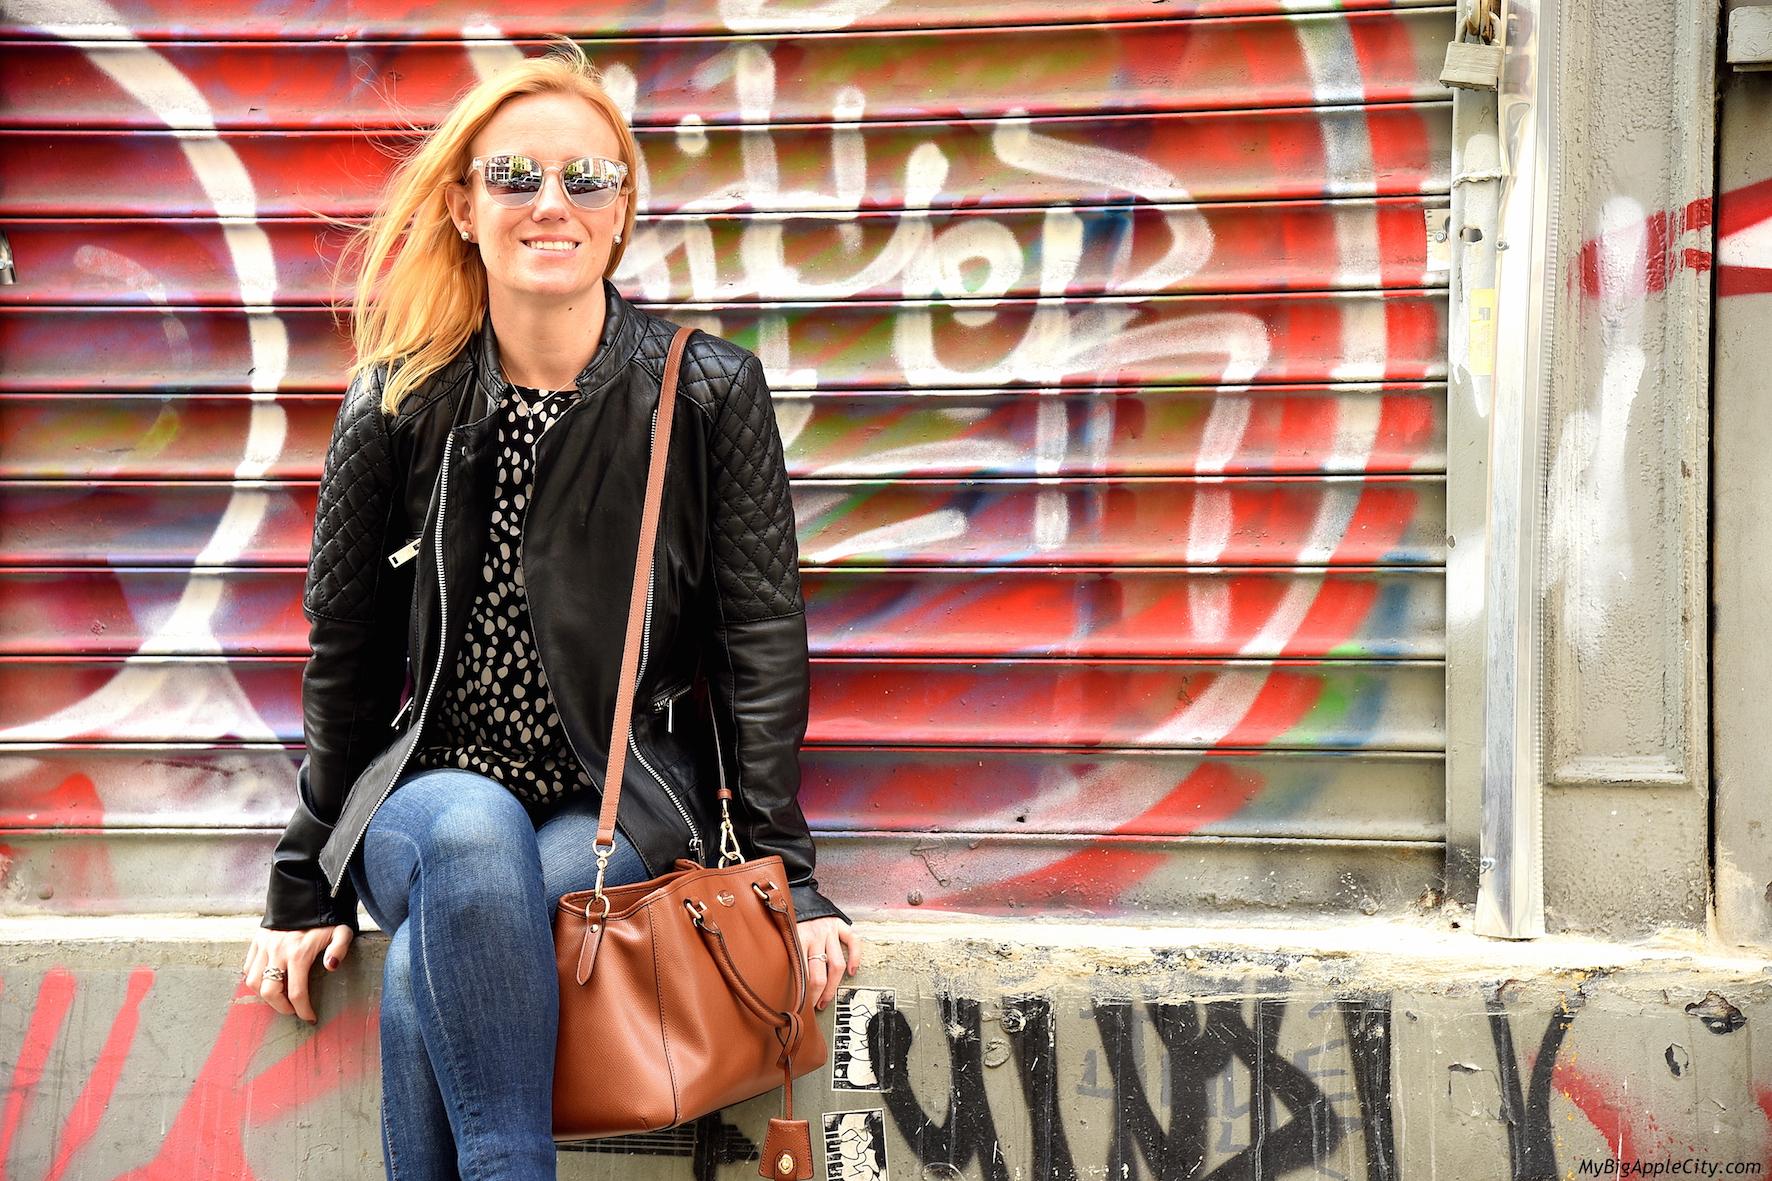 NYC-outfit-streetstyle-Fall-Fashion-Style-blogger-MyBigAppleCity